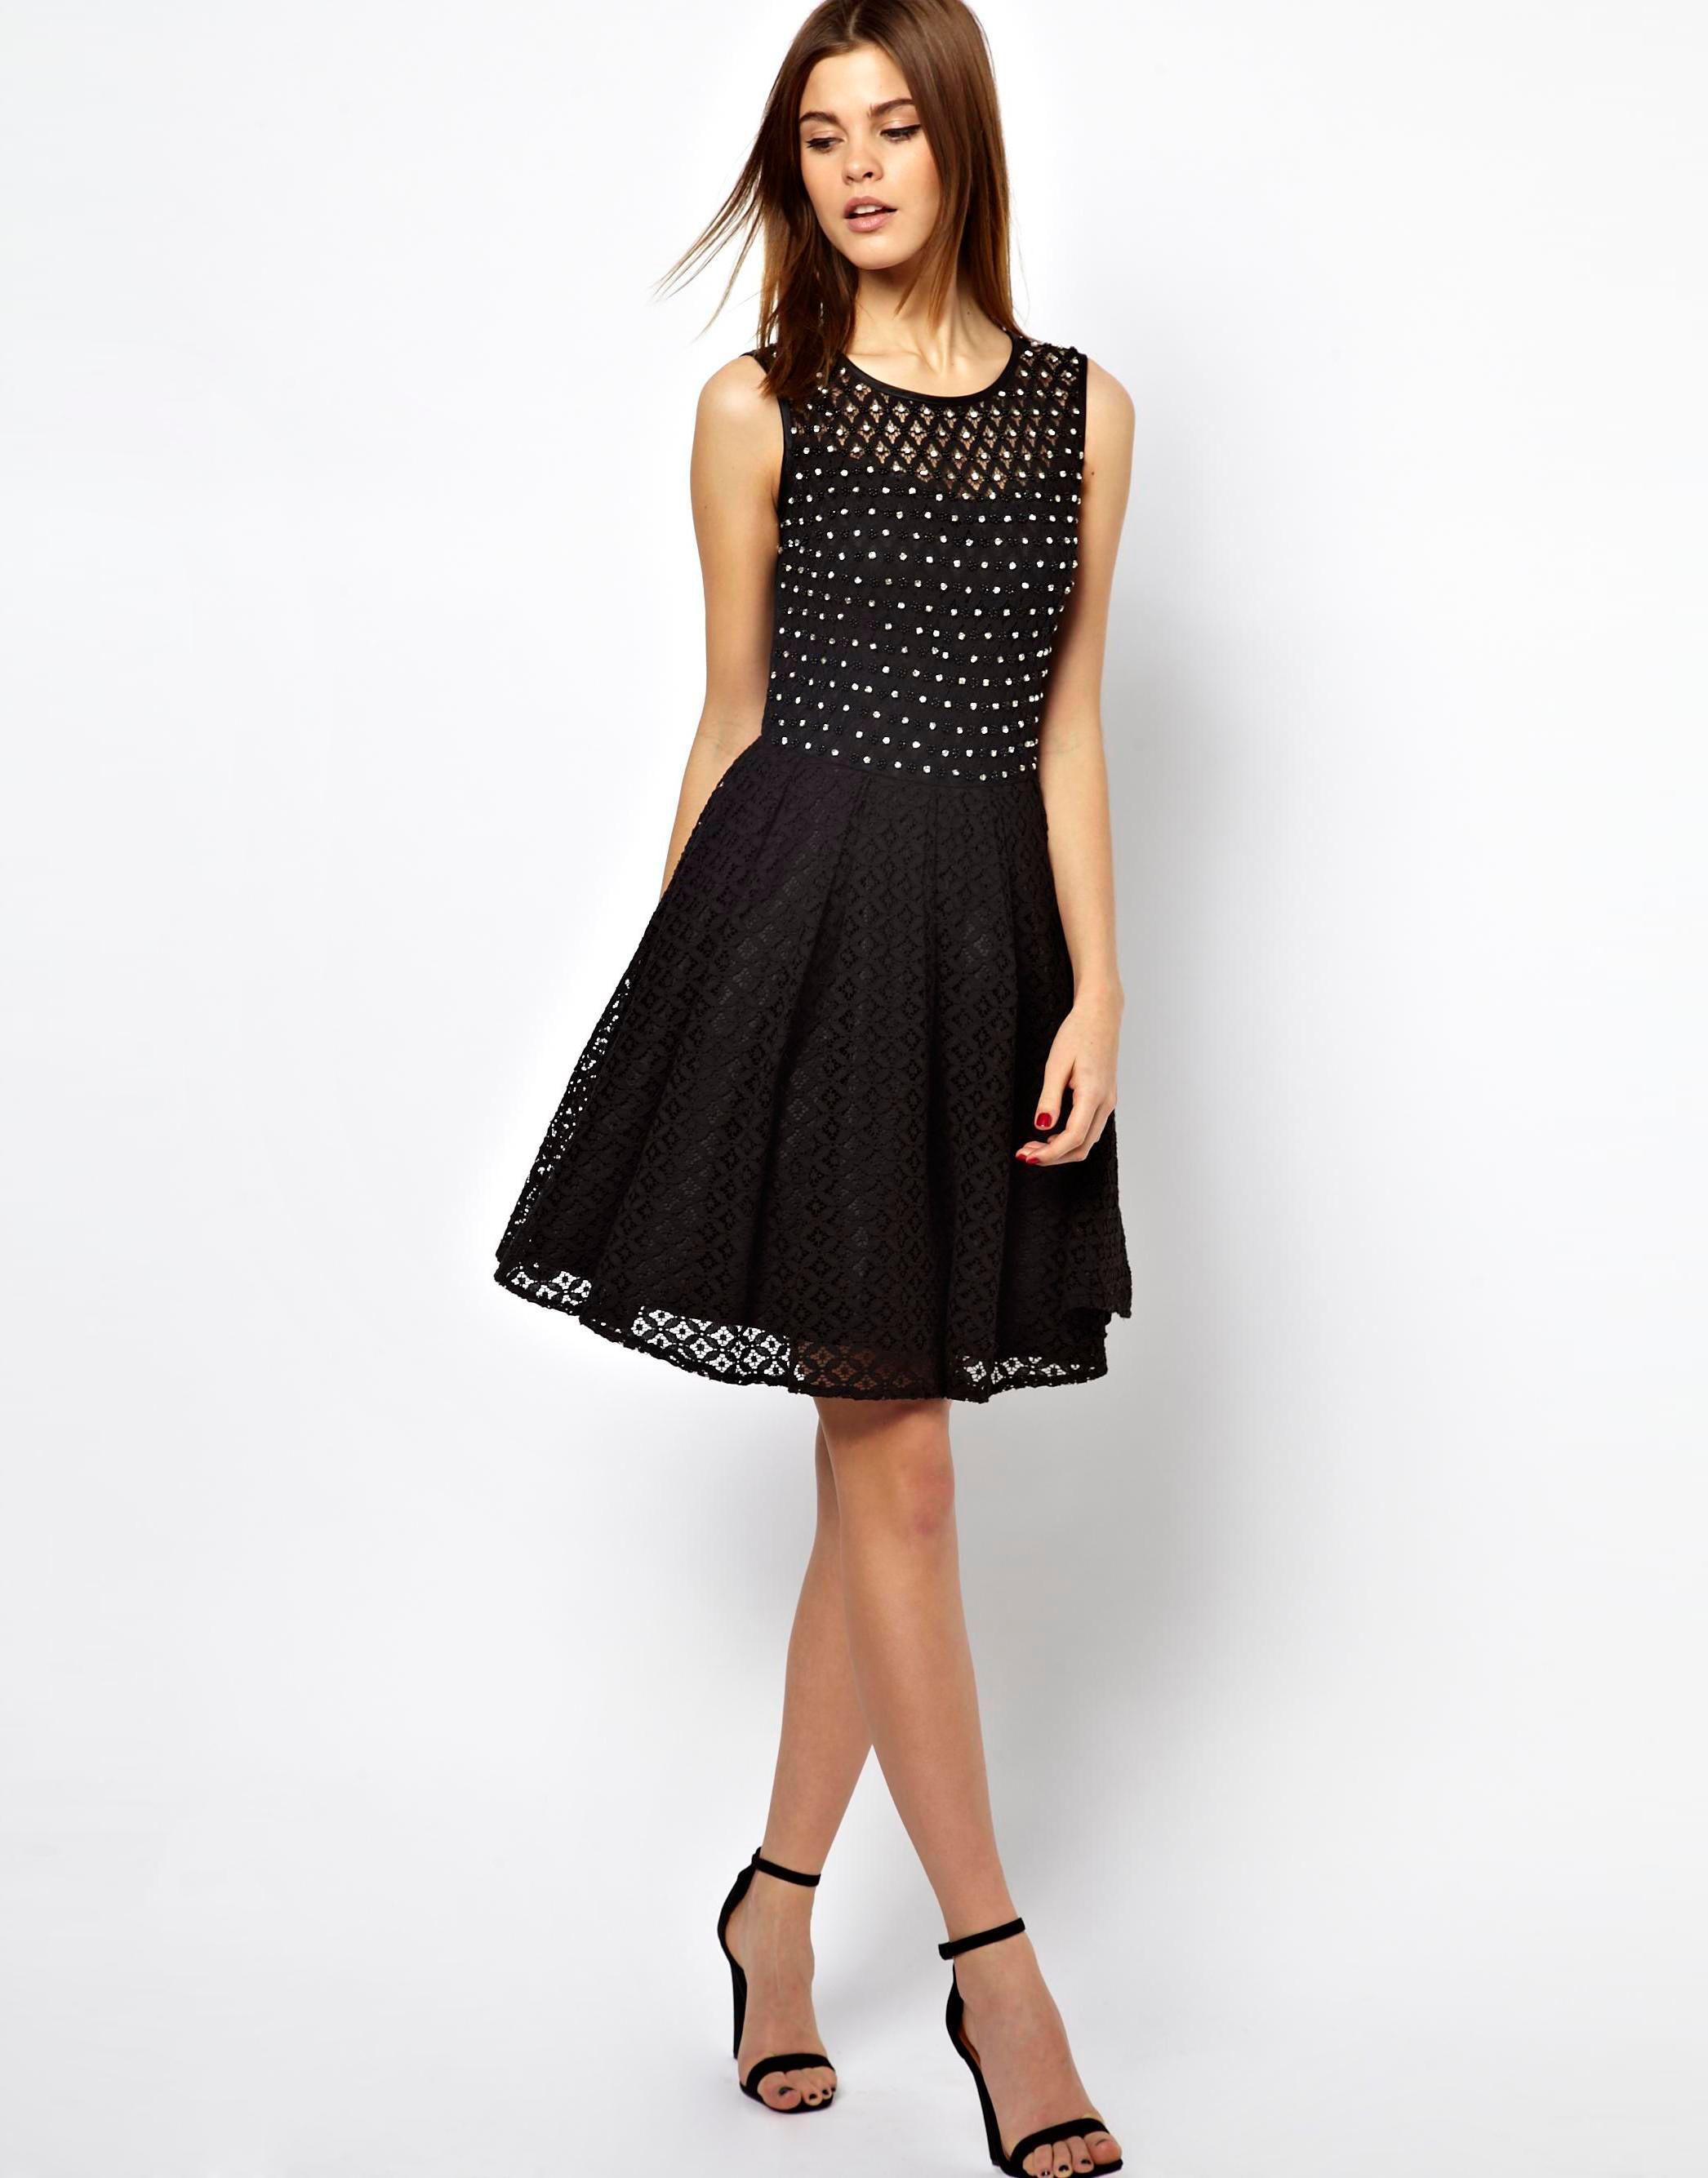 Asos A Wear Lace Skater Dress With Embellishment 3603473 Jordan Cohayney Dresses Lace Skater Dress Outfits [ 2668 x 2092 Pixel ]